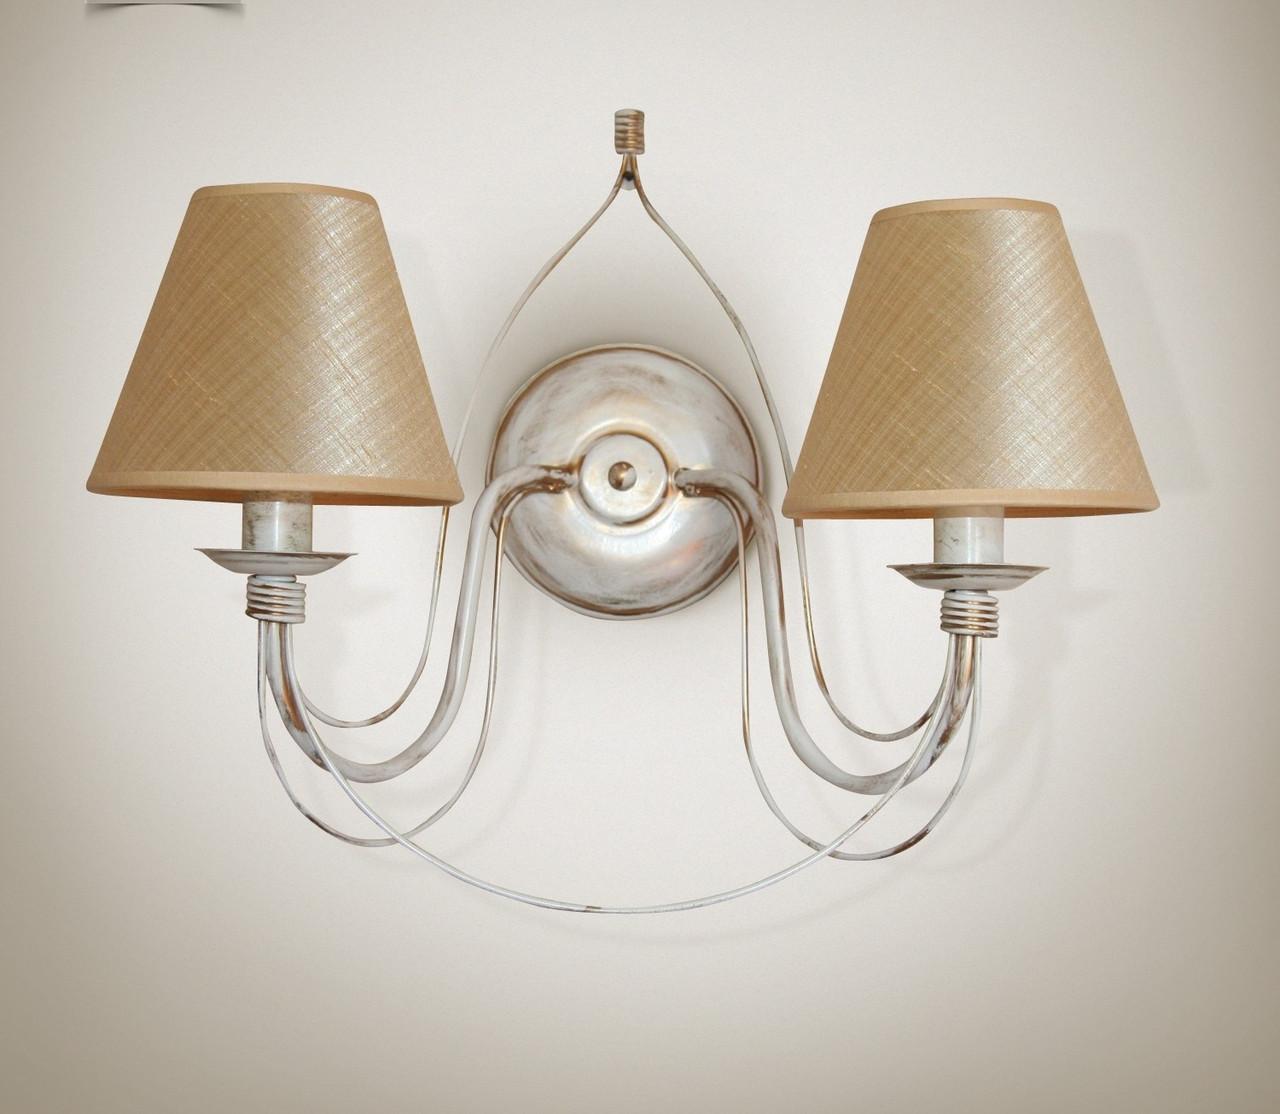 Бра 2-х ламповое, настенный светильник  18320-4